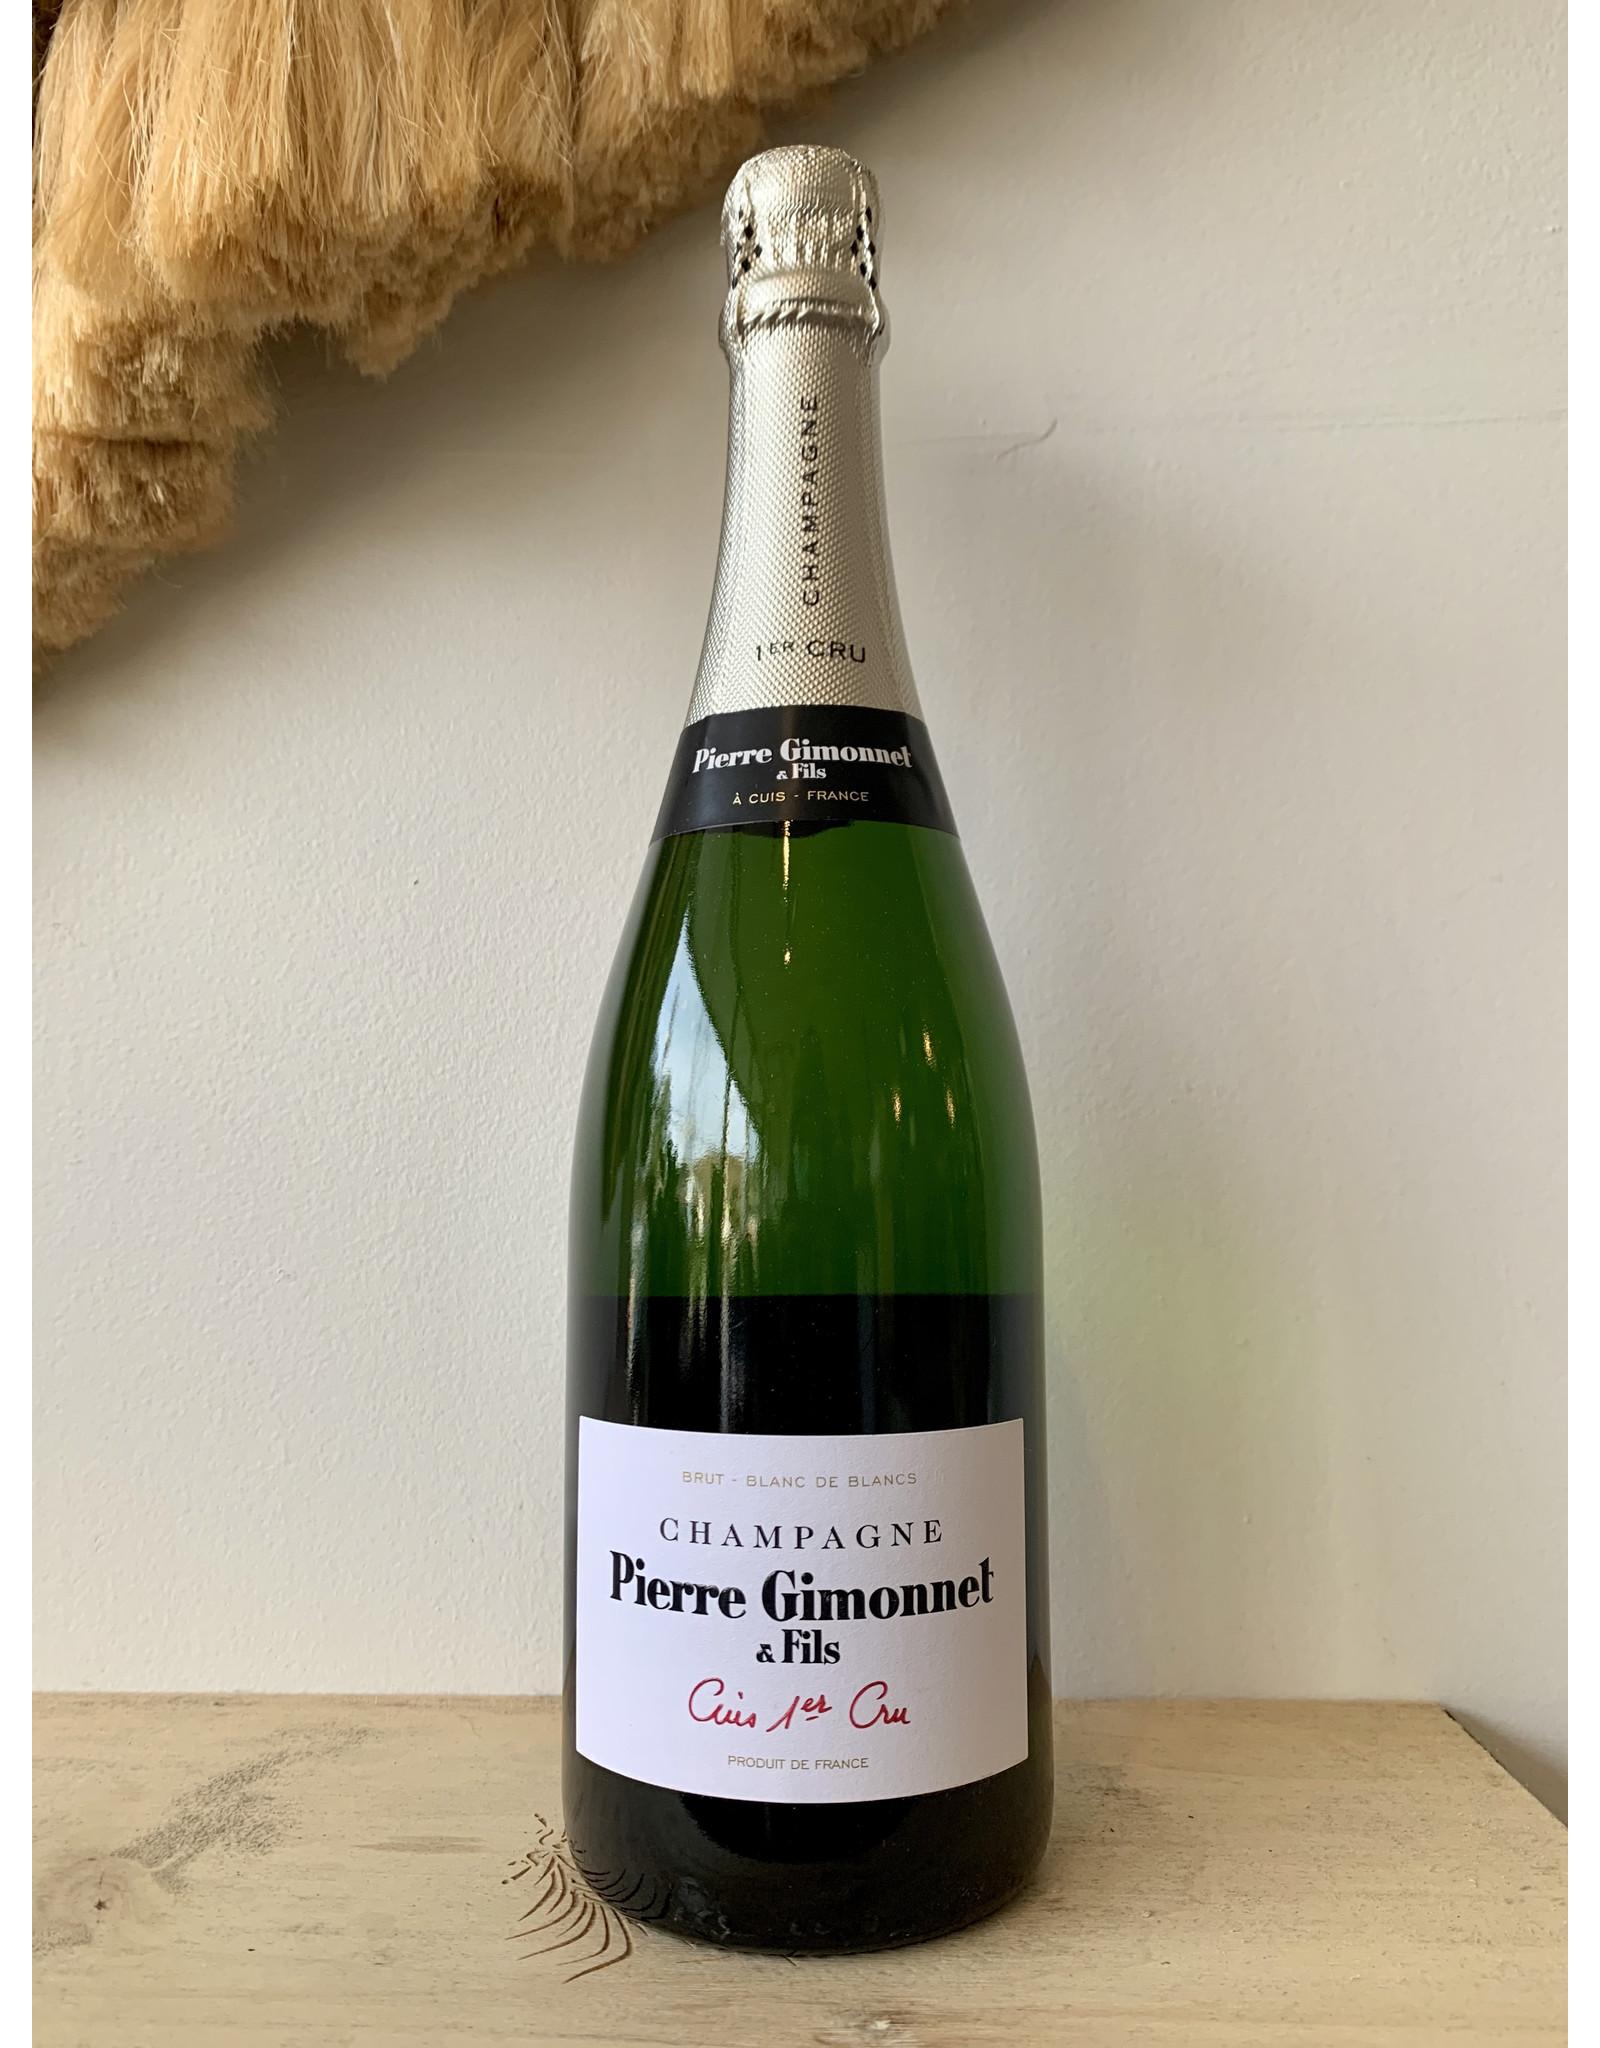 Champagne Pierre Gimonnet & Fils 1er Cru Blanc de Blancs